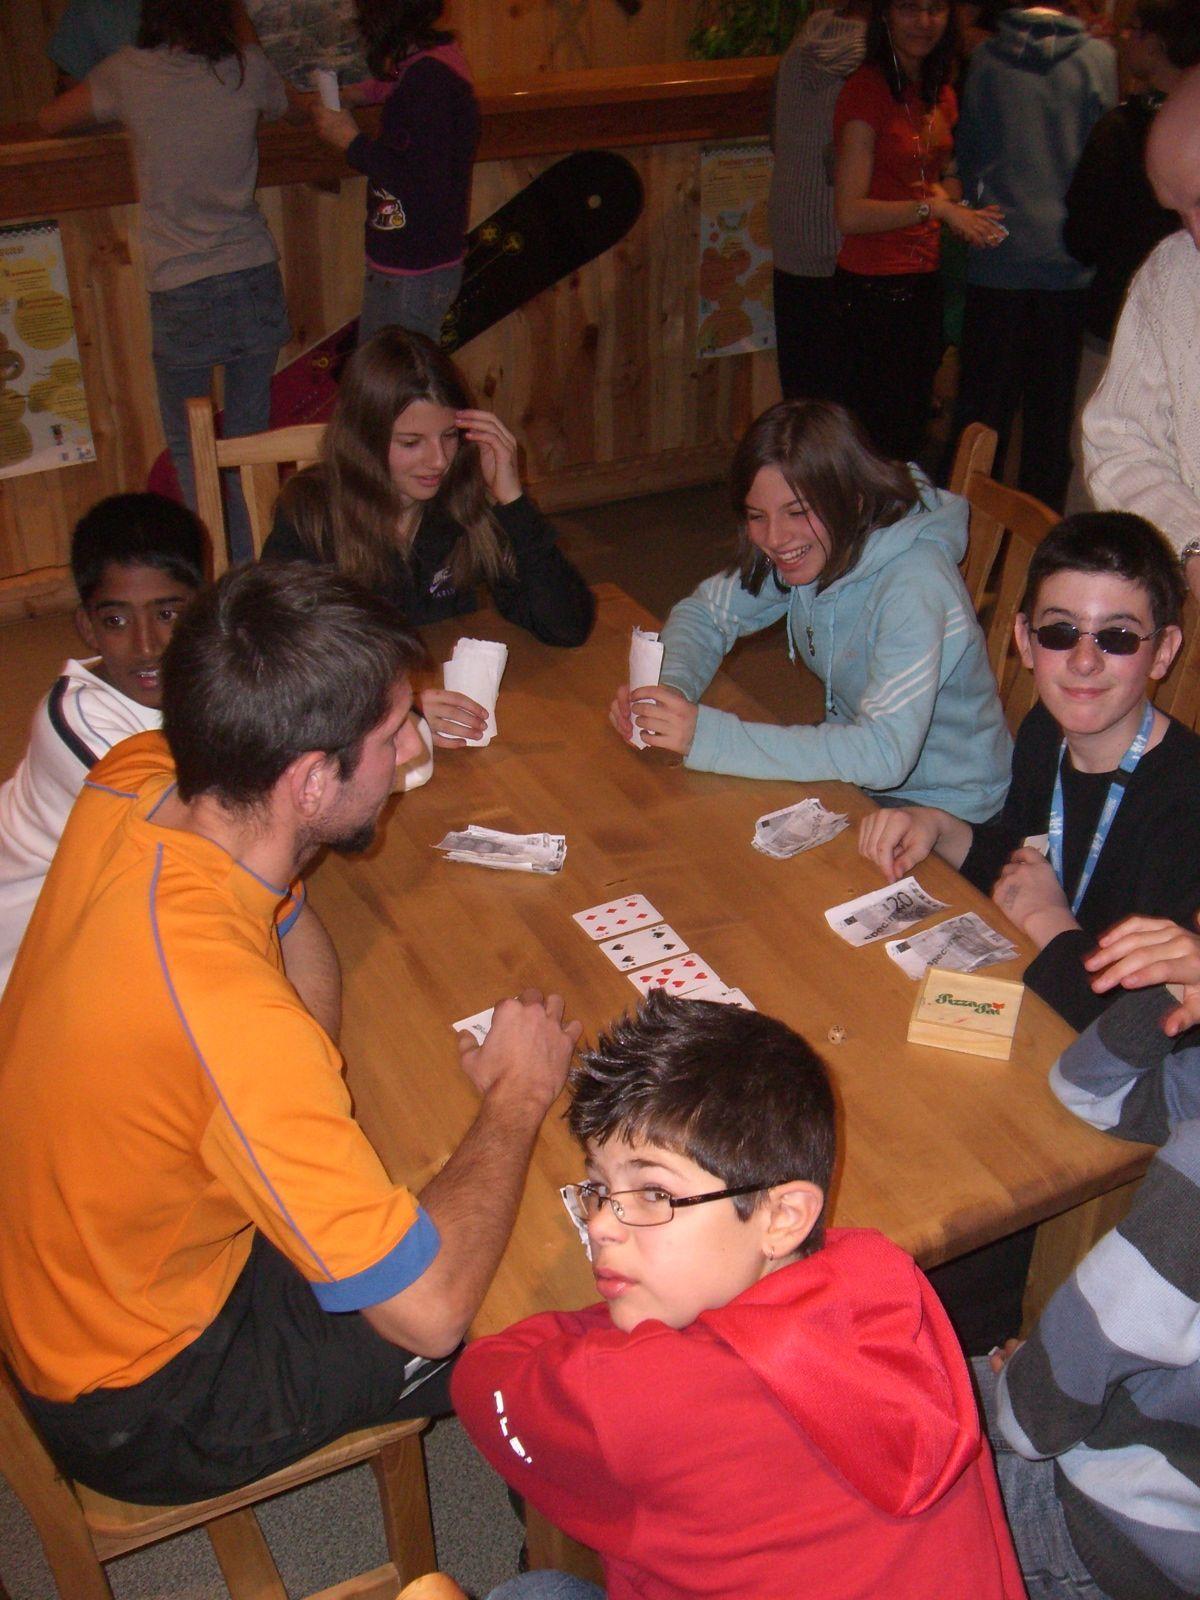 Casino a 16 ans